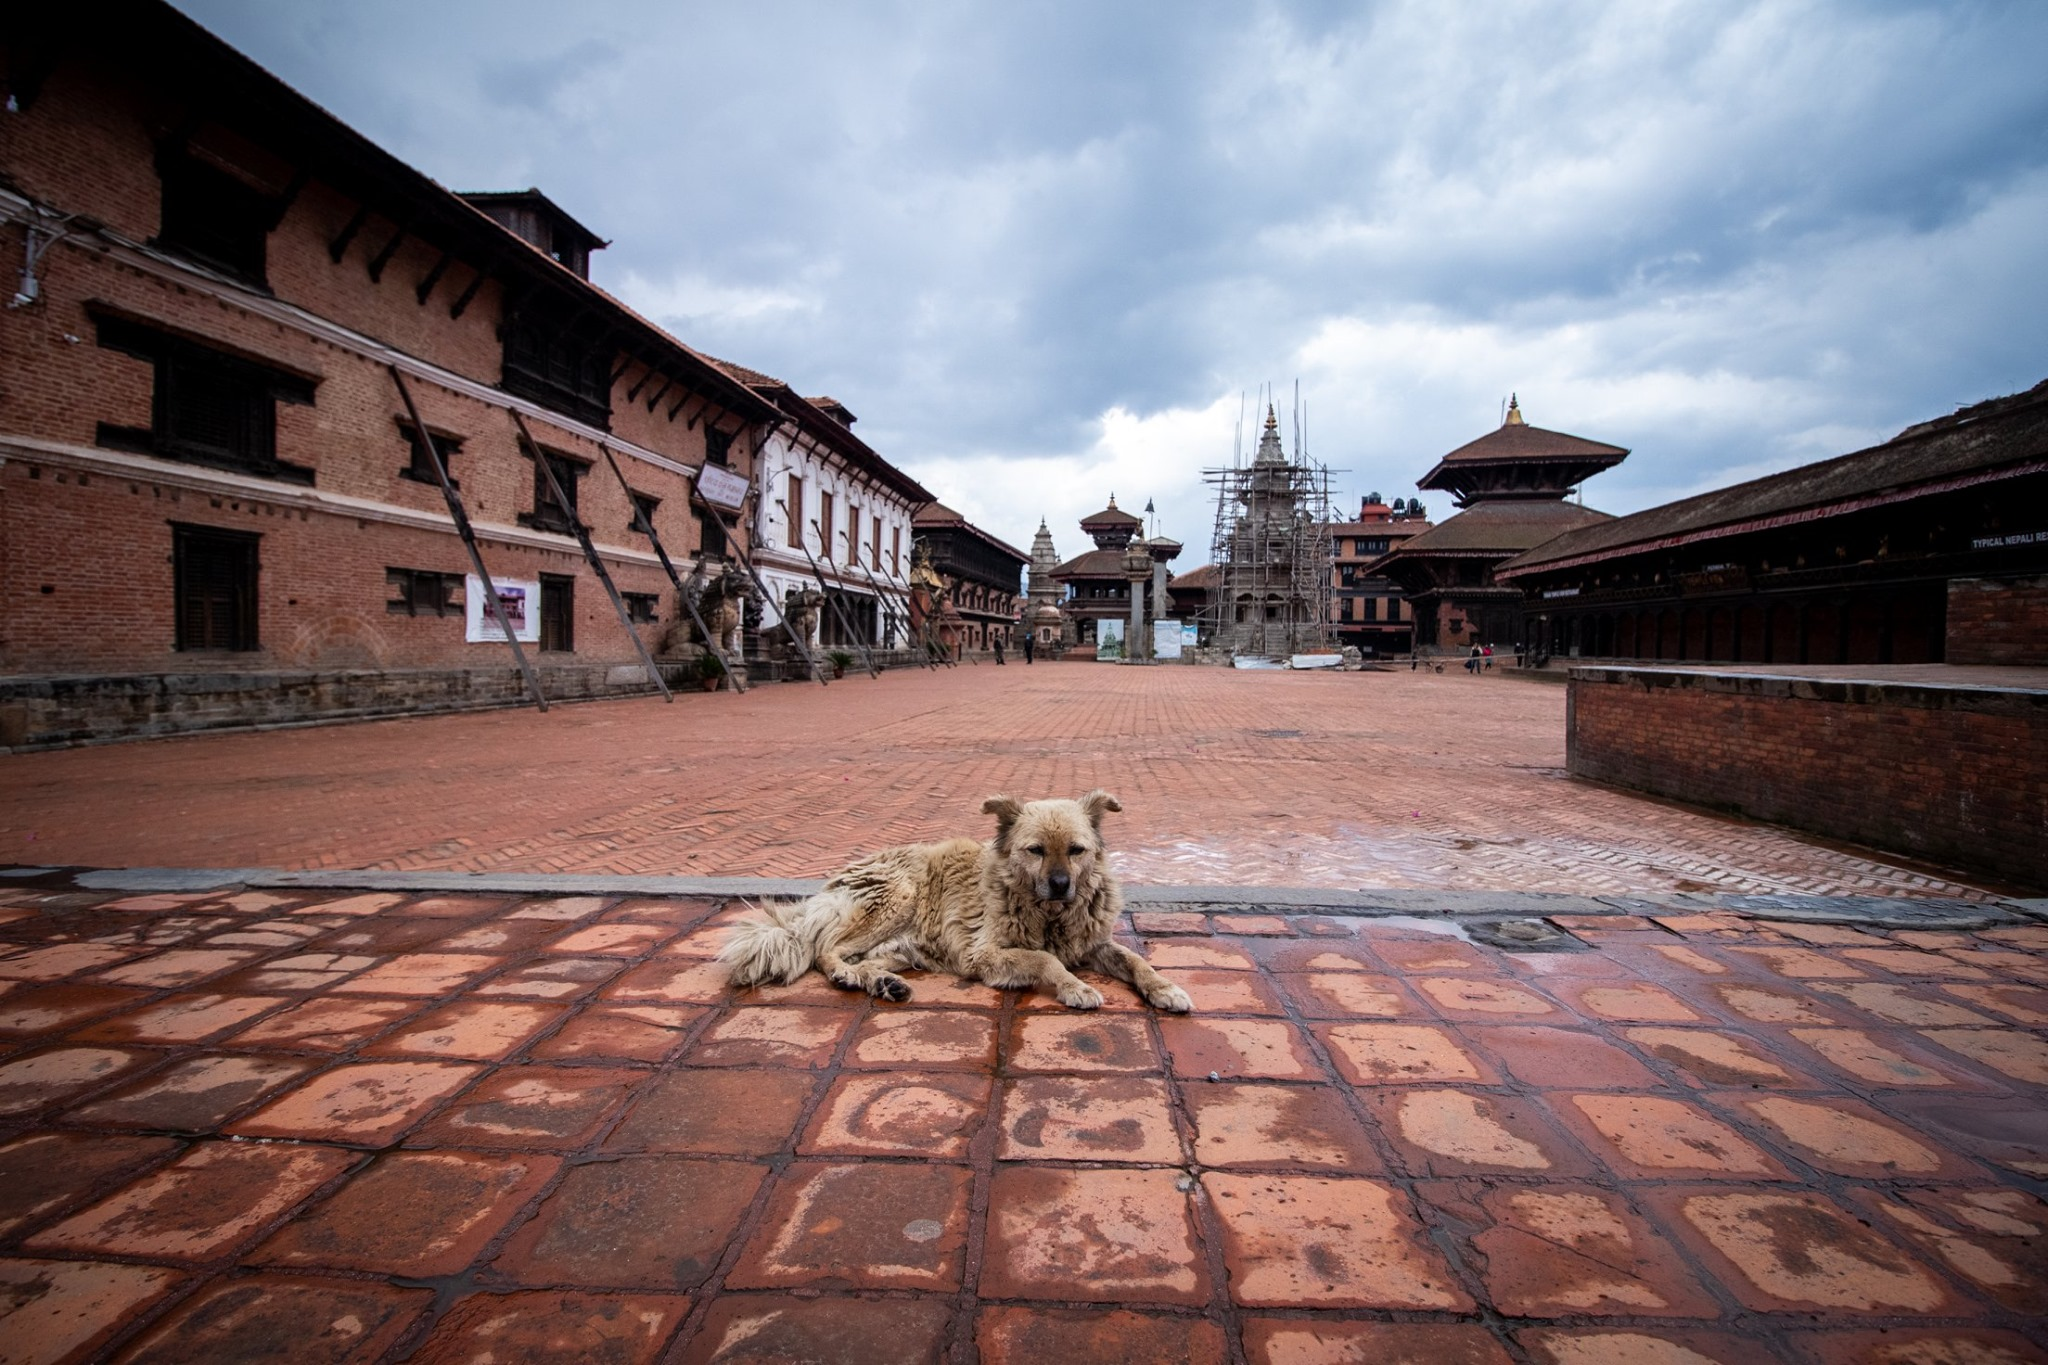 https://www.bhaktapur.com/wp-content/uploads/2020/06/durbarsquare-Amit-Machamasi.jpg